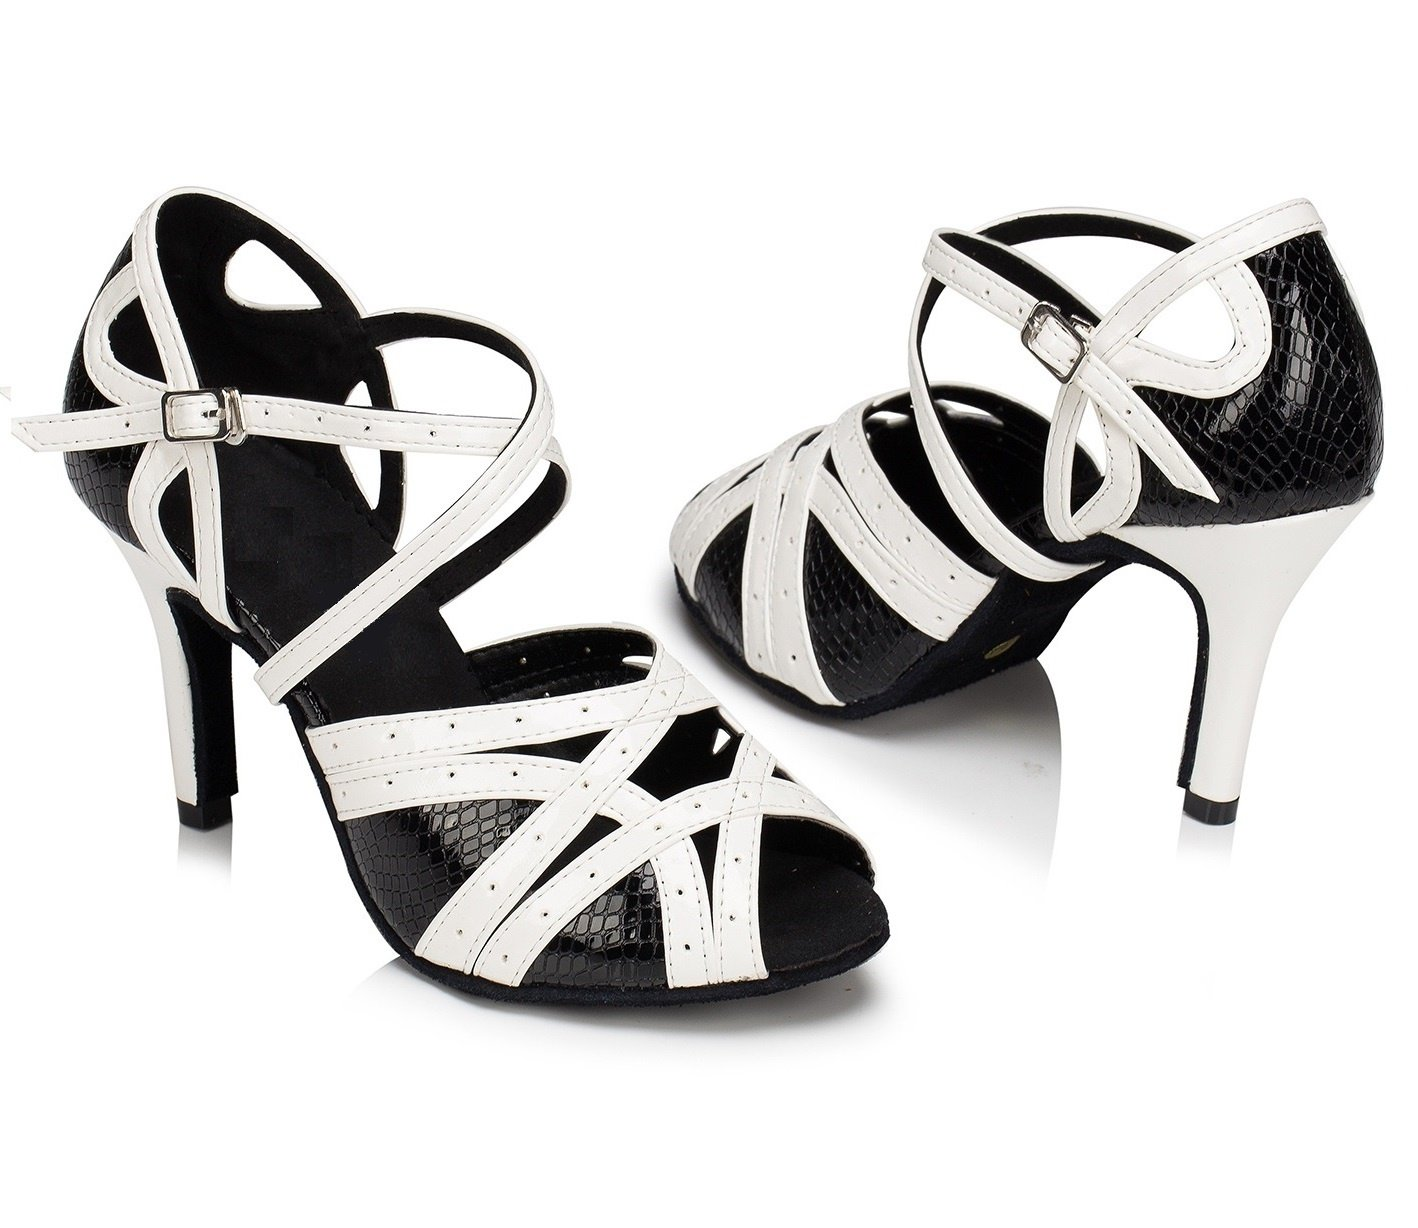 KAI-ROAD Womens Black Latin Dance Shoes Ballroom Dancing Heels 8.5cm High Heels Suede Sole Salsa Shoes (9.5 B(M) US)